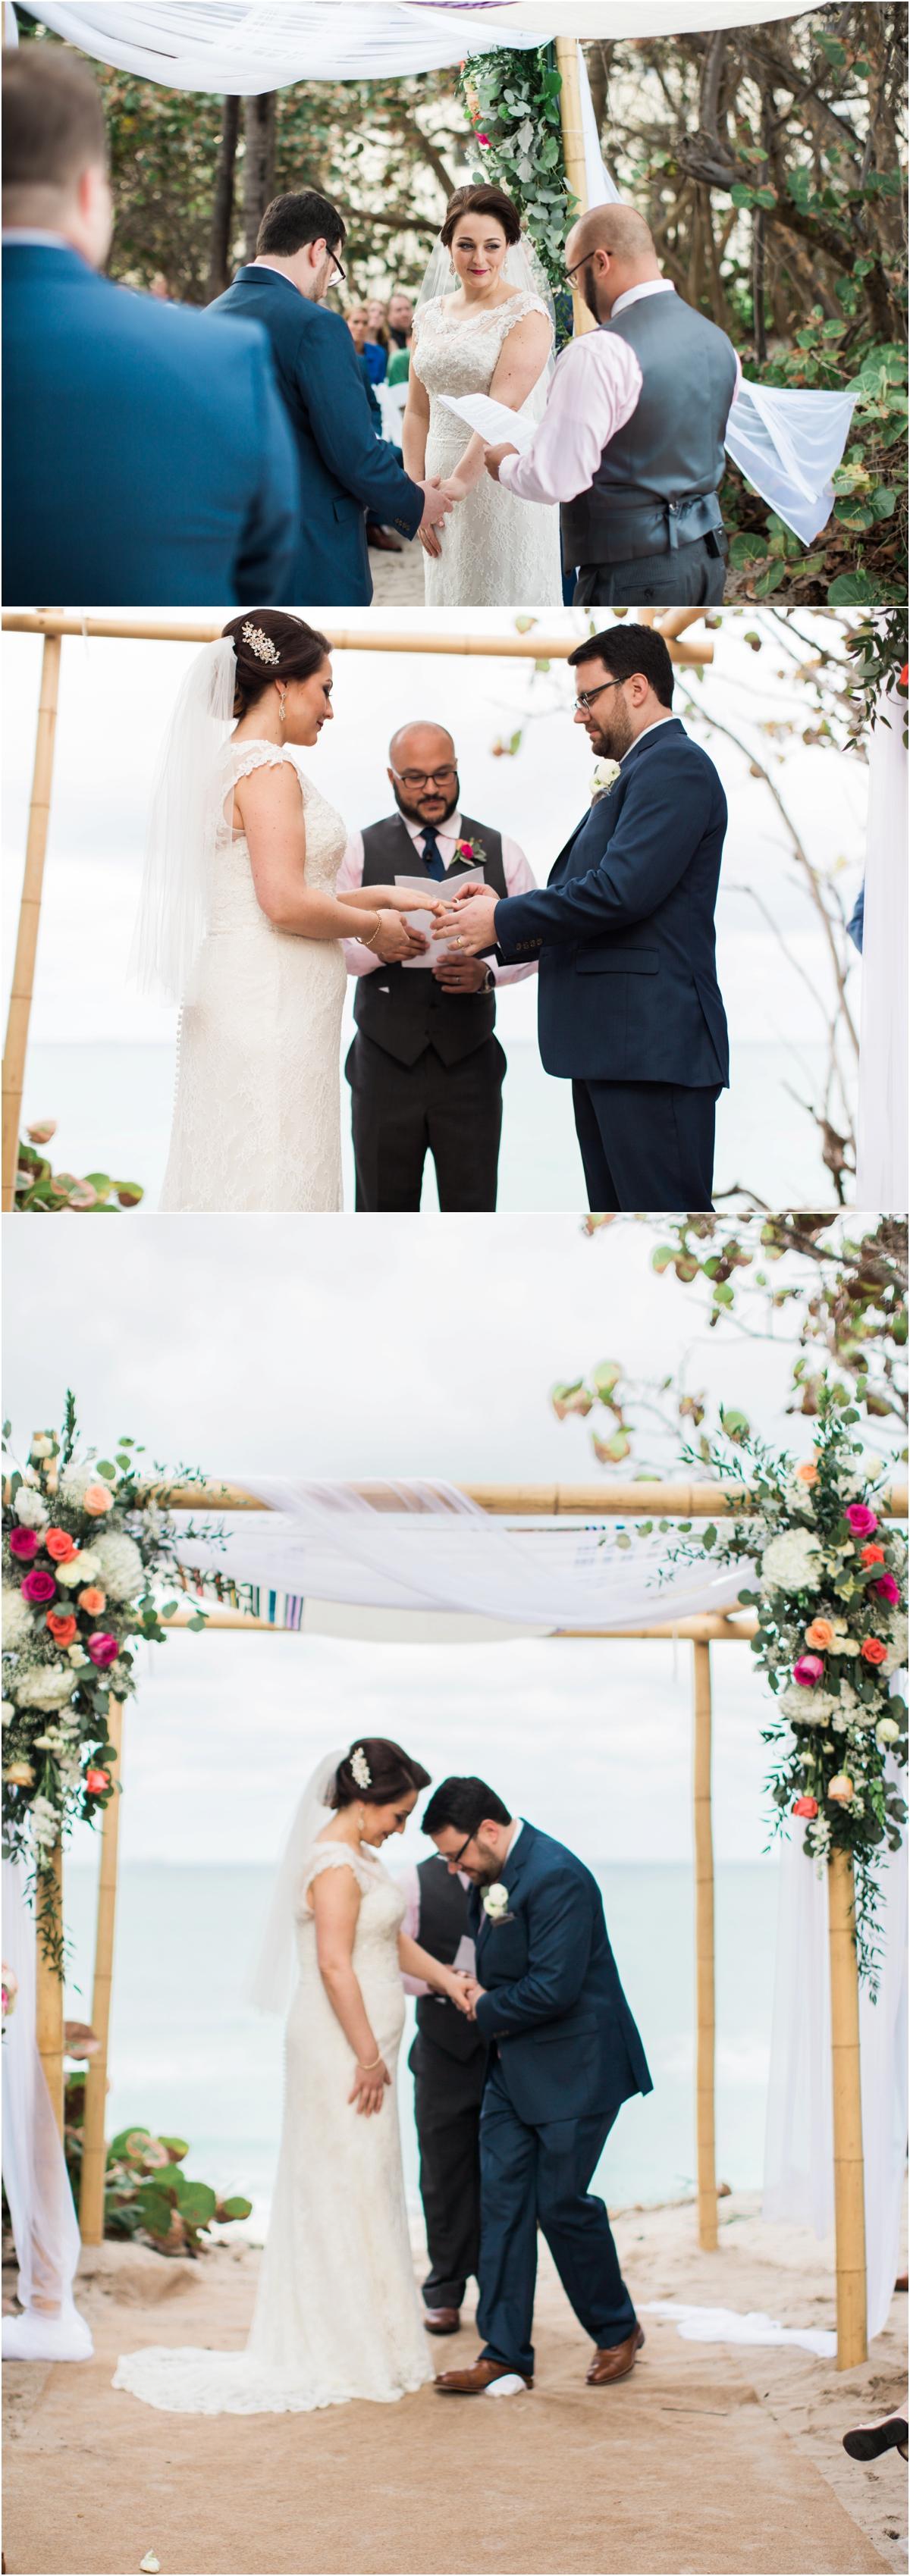 Jupiter-Beach-Resort-Wedding-Venue-photos_0019